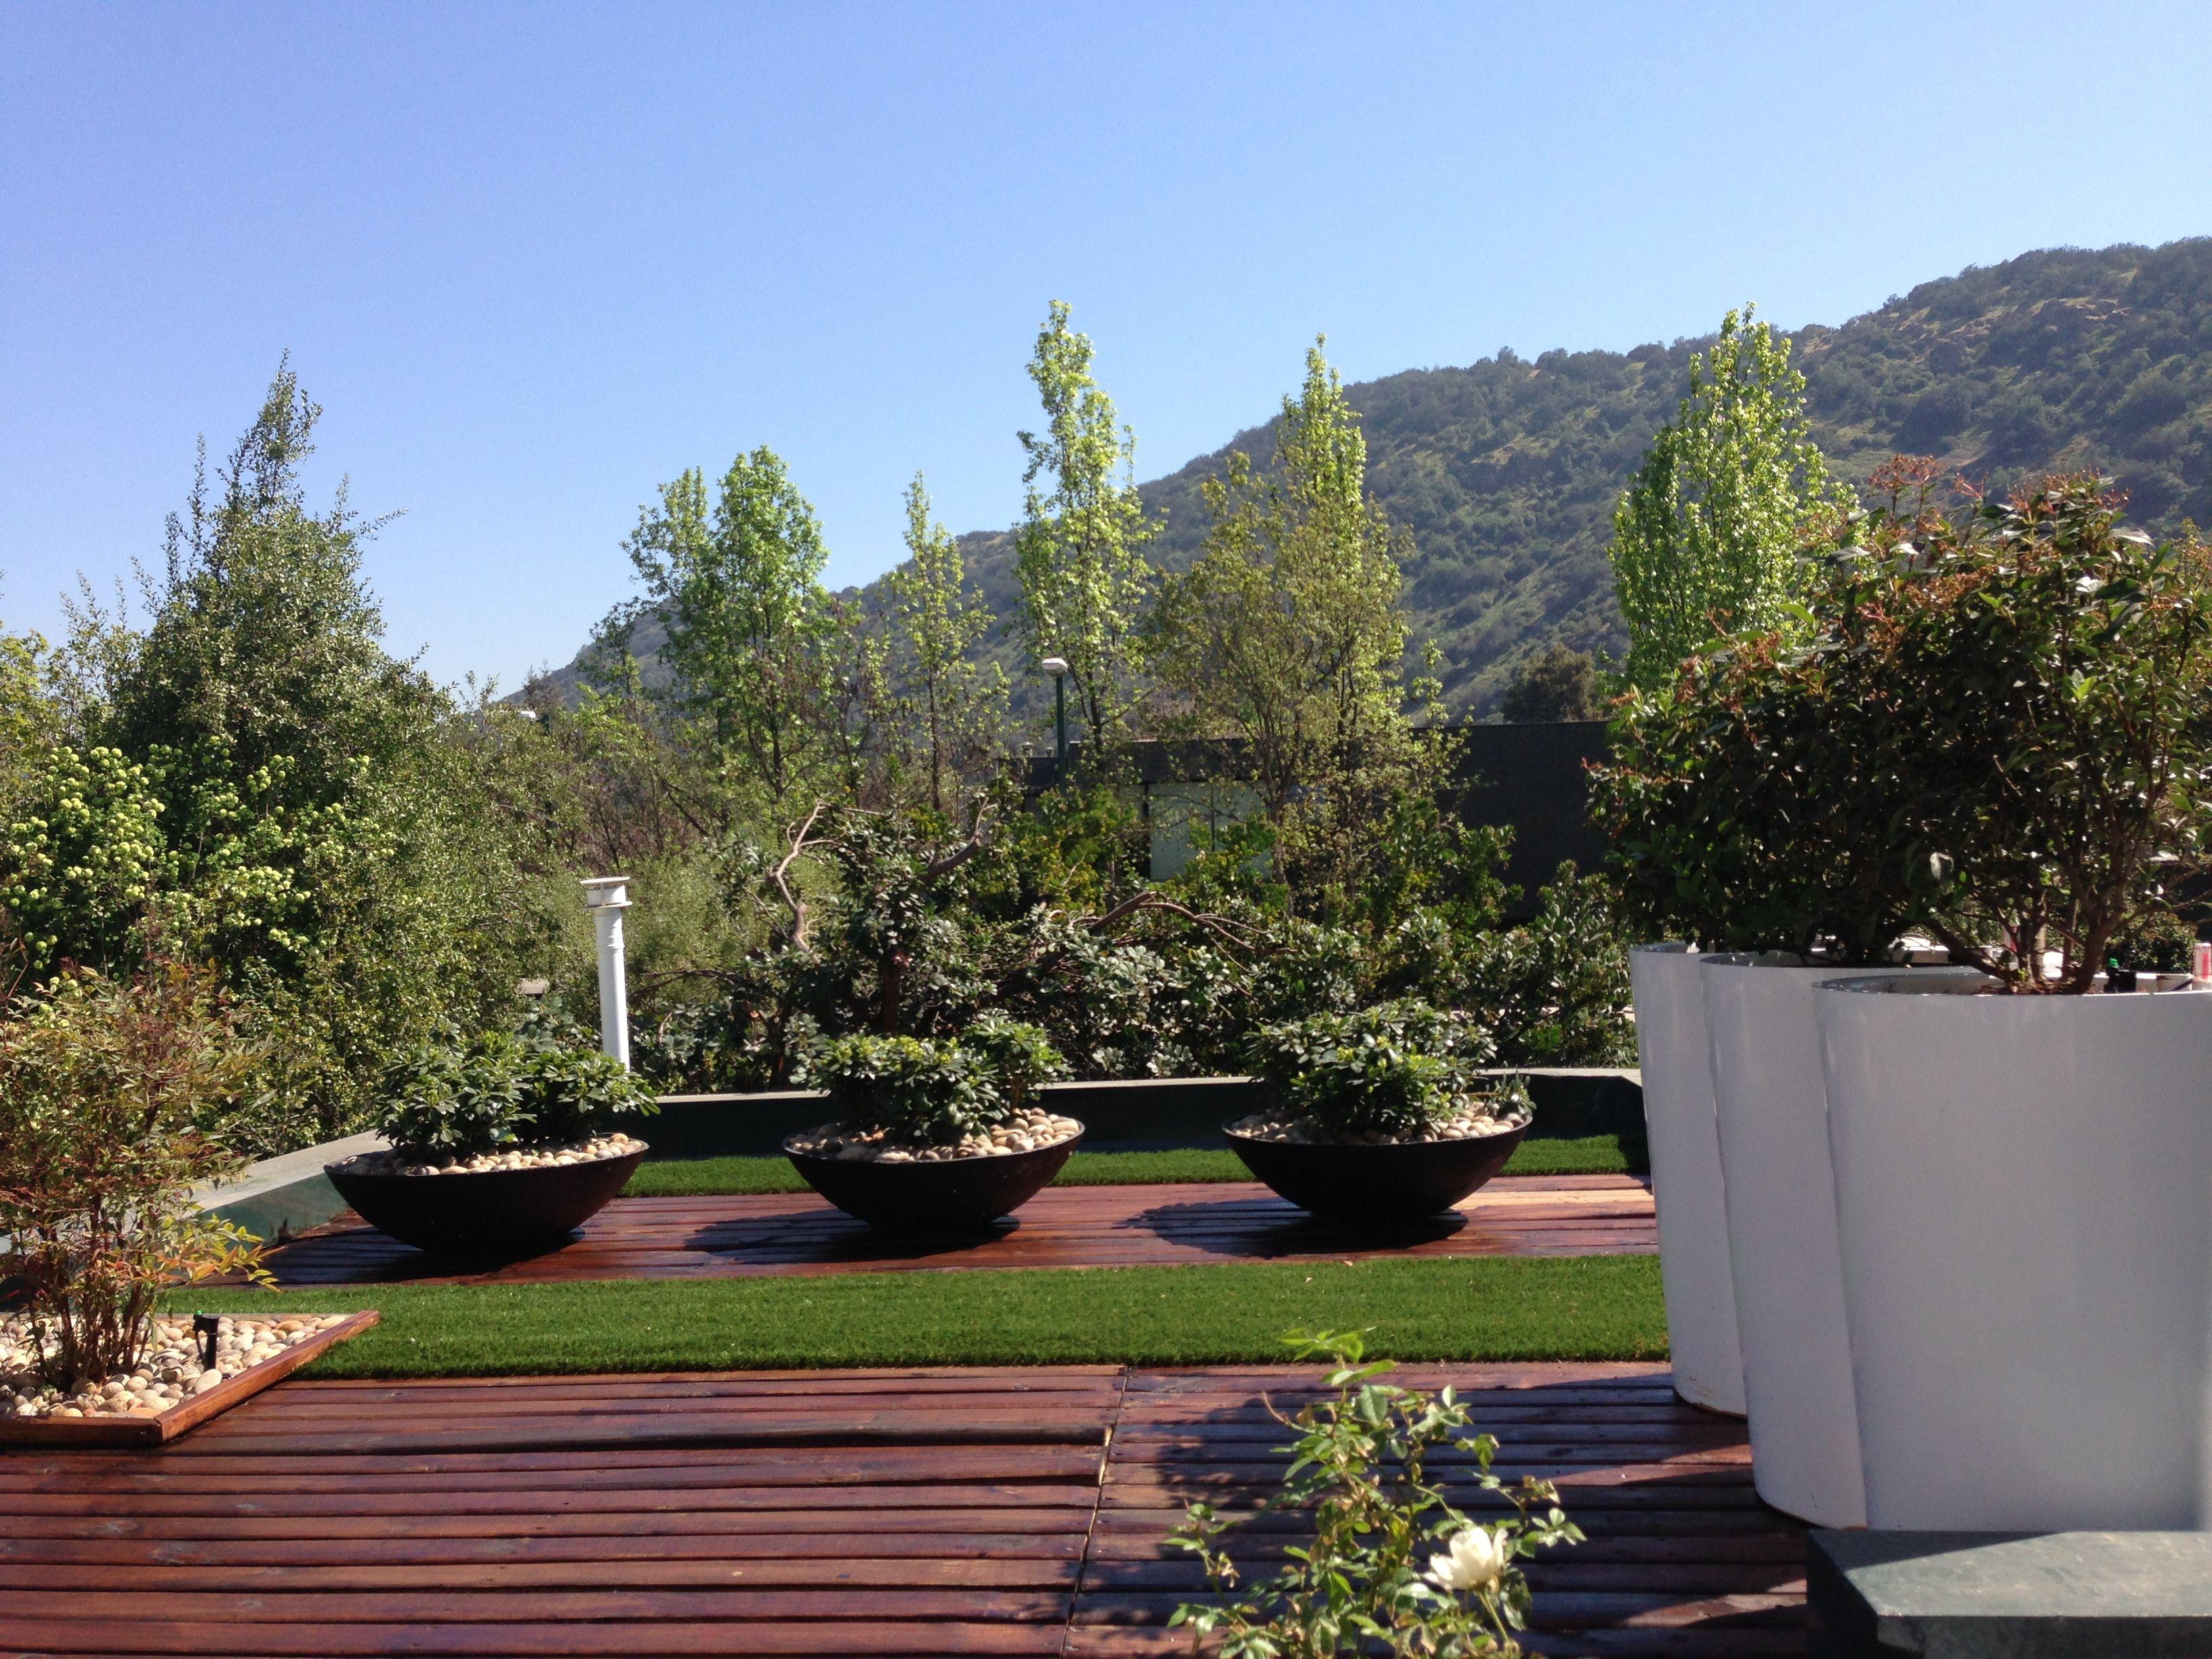 Techo en santiago de chile jardines modernos pinterest for Jardines modernos